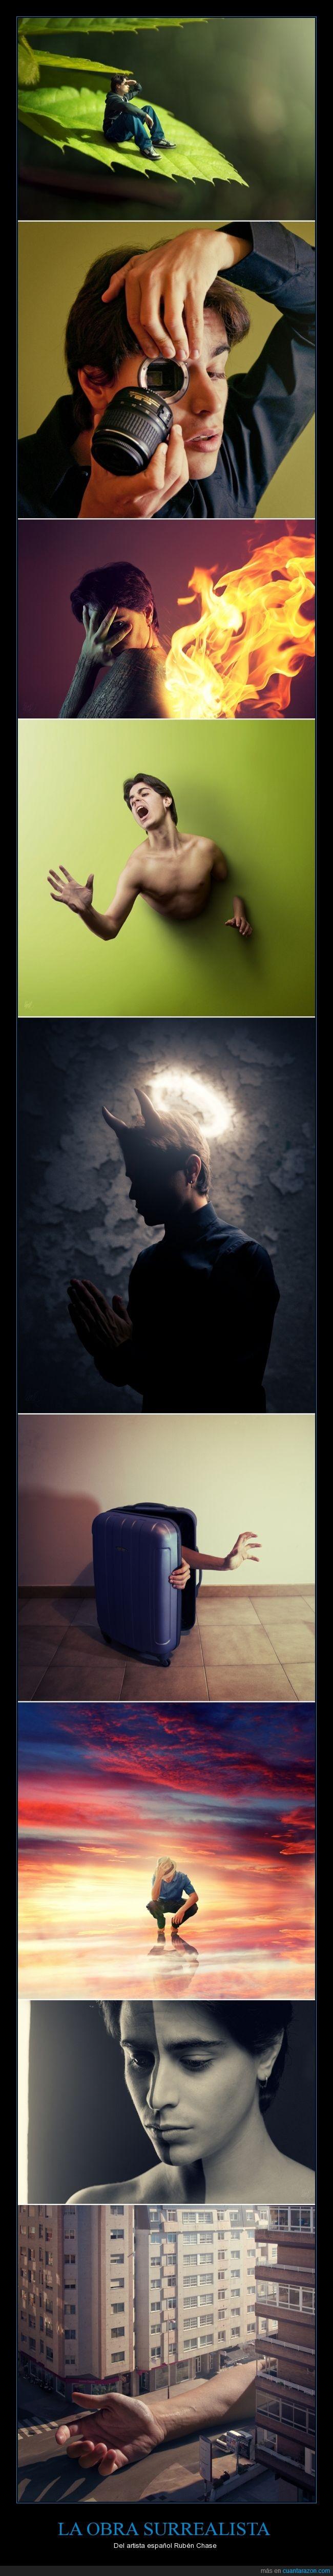 arte,español,fotografia,mano,montaje,obra,photoshop,Rubén Chase,surrealista